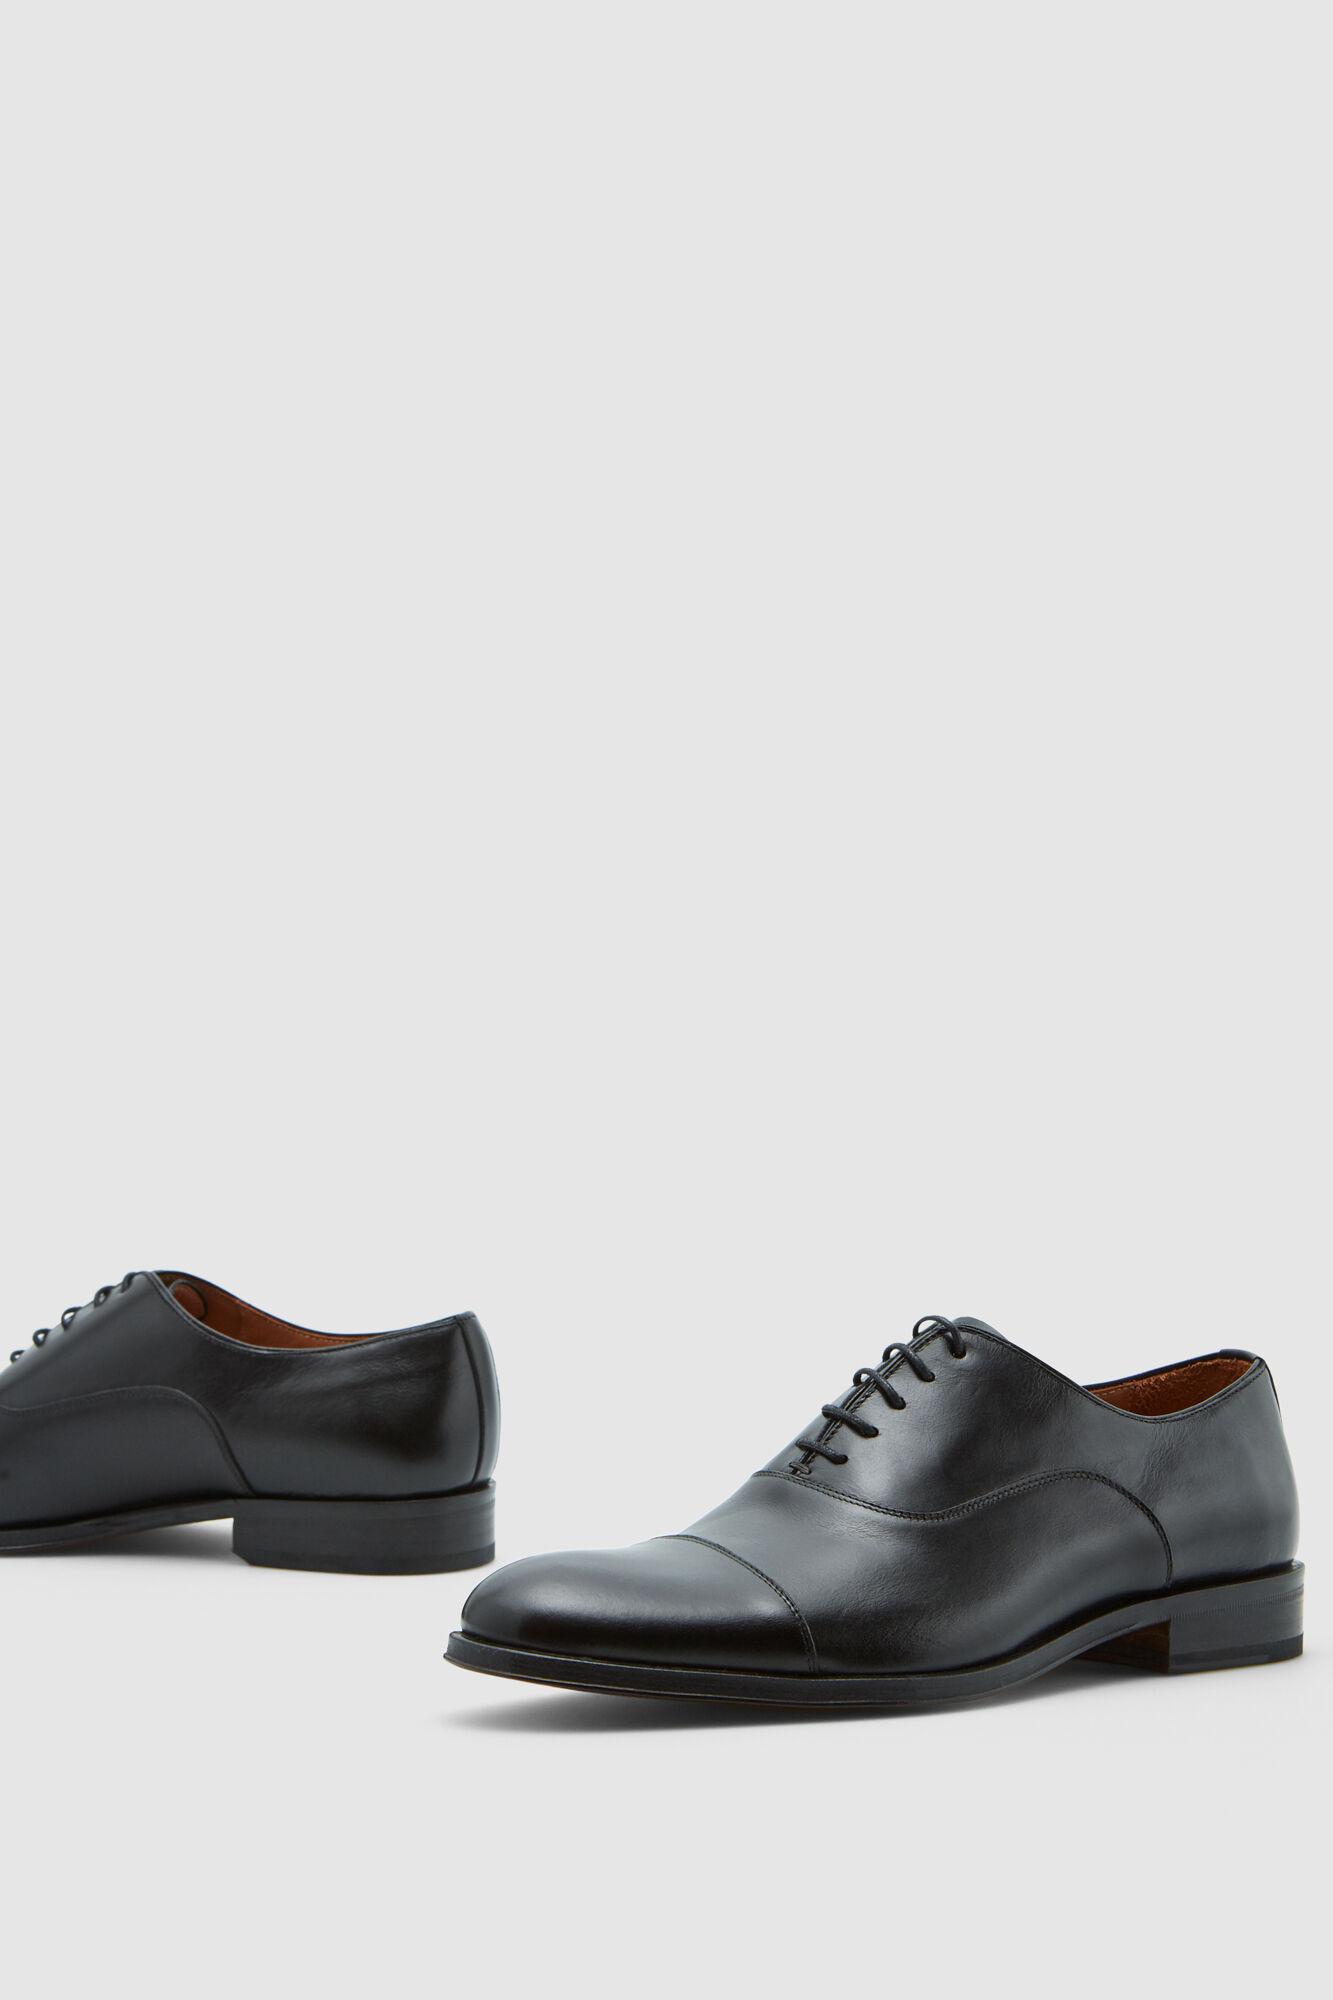 Sapato pele oxford cordões